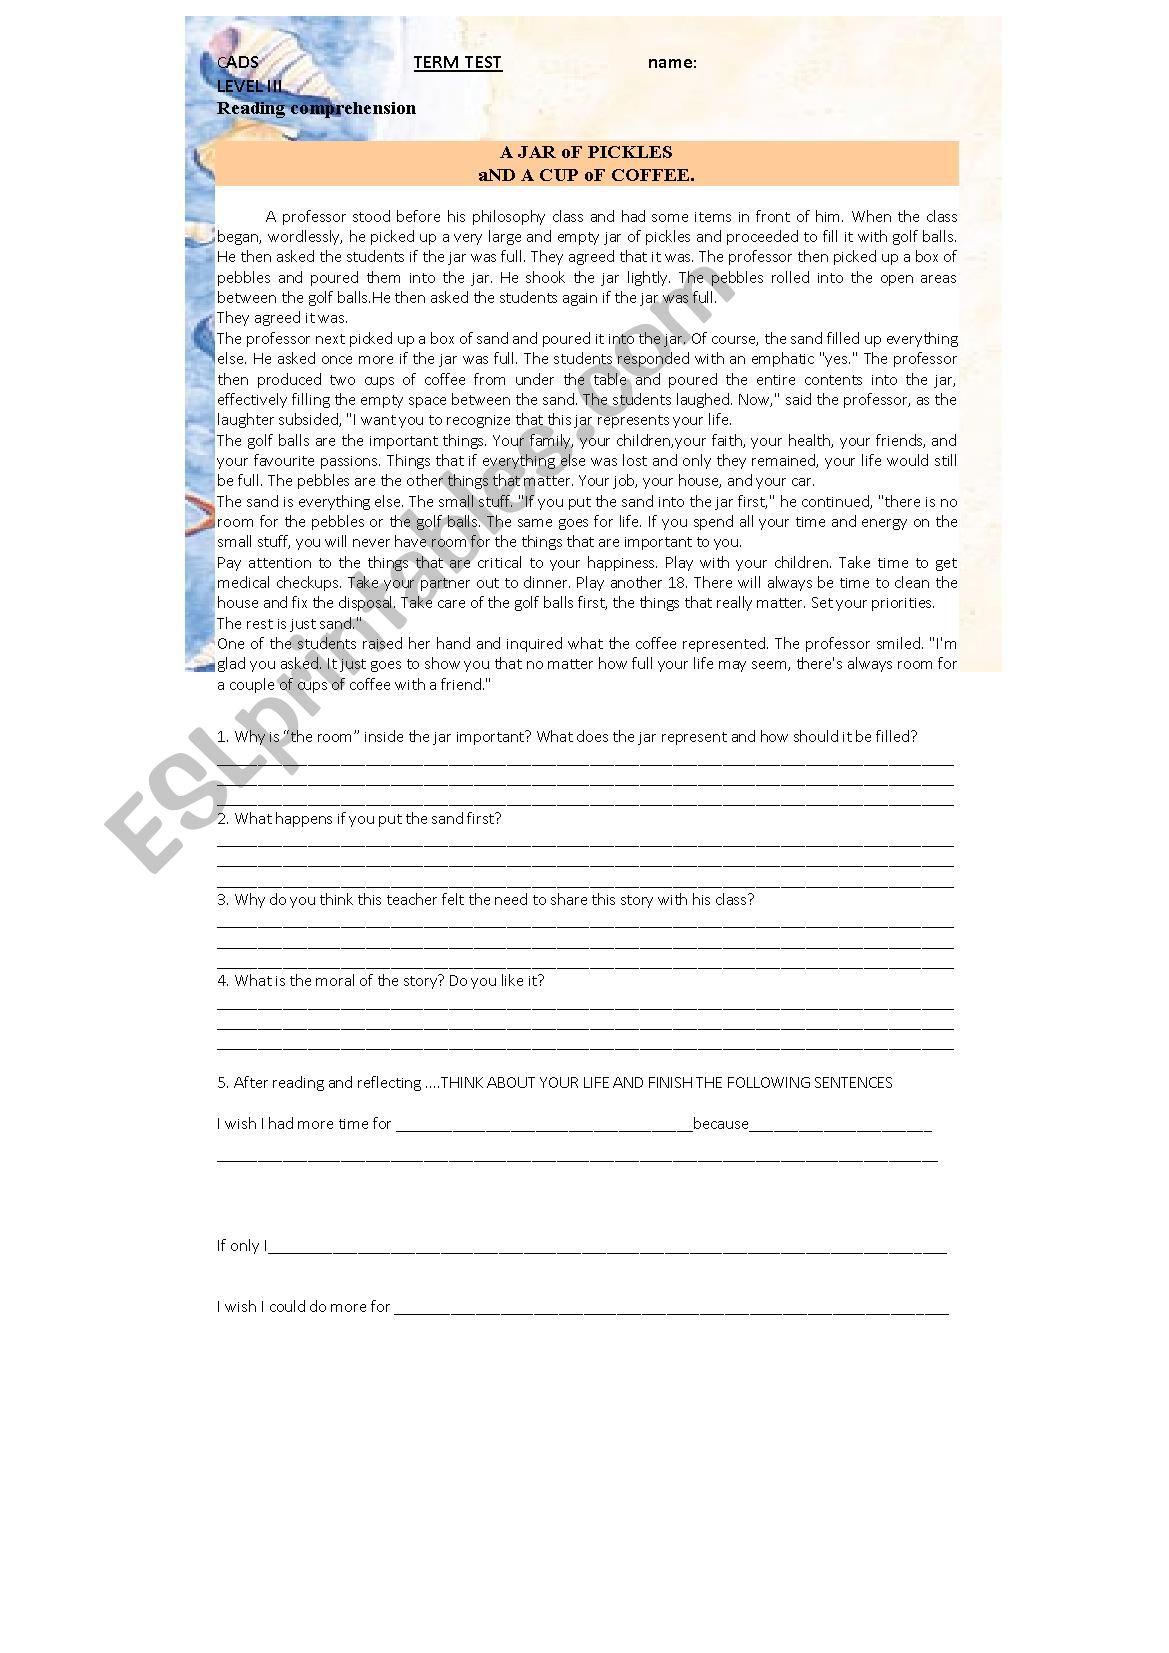 Test Intermediate Level Reading Grammar And Writing